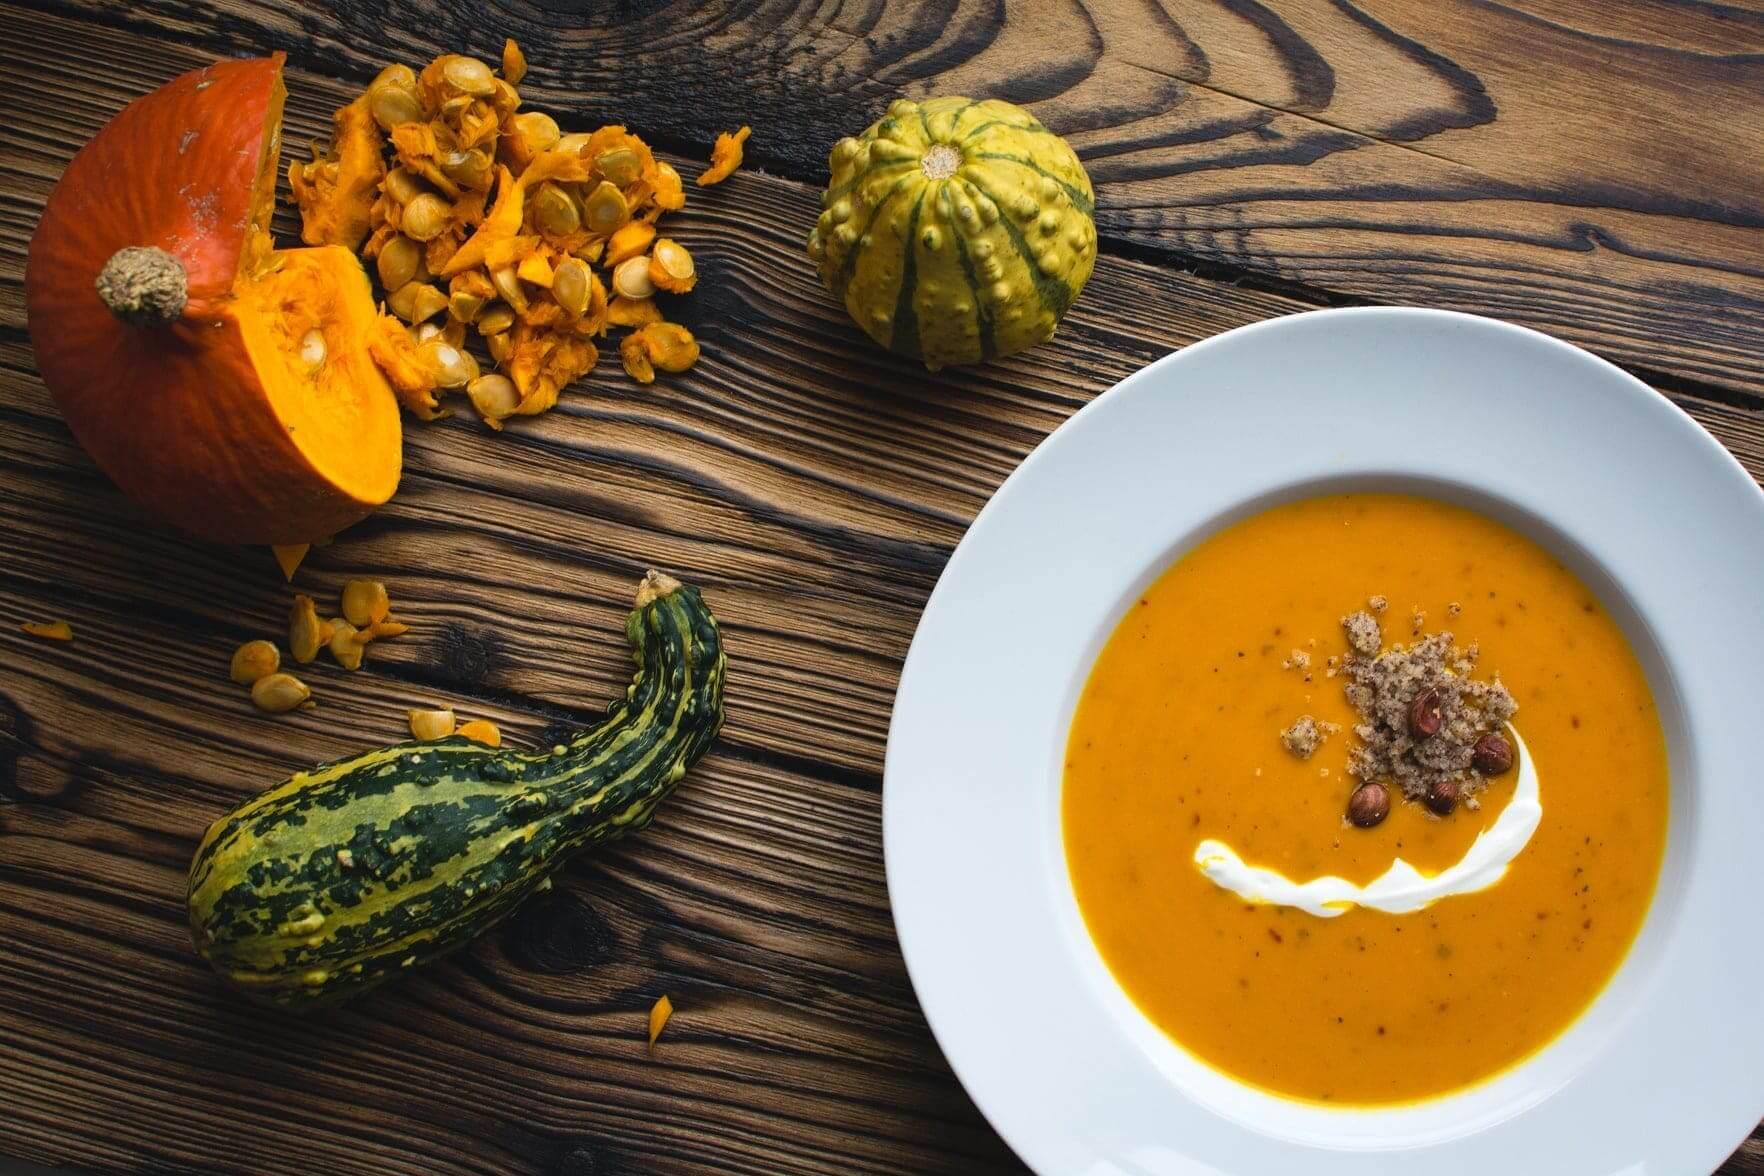 """My Soup Maker Creamy Pumpkin & Garlic Soup"""